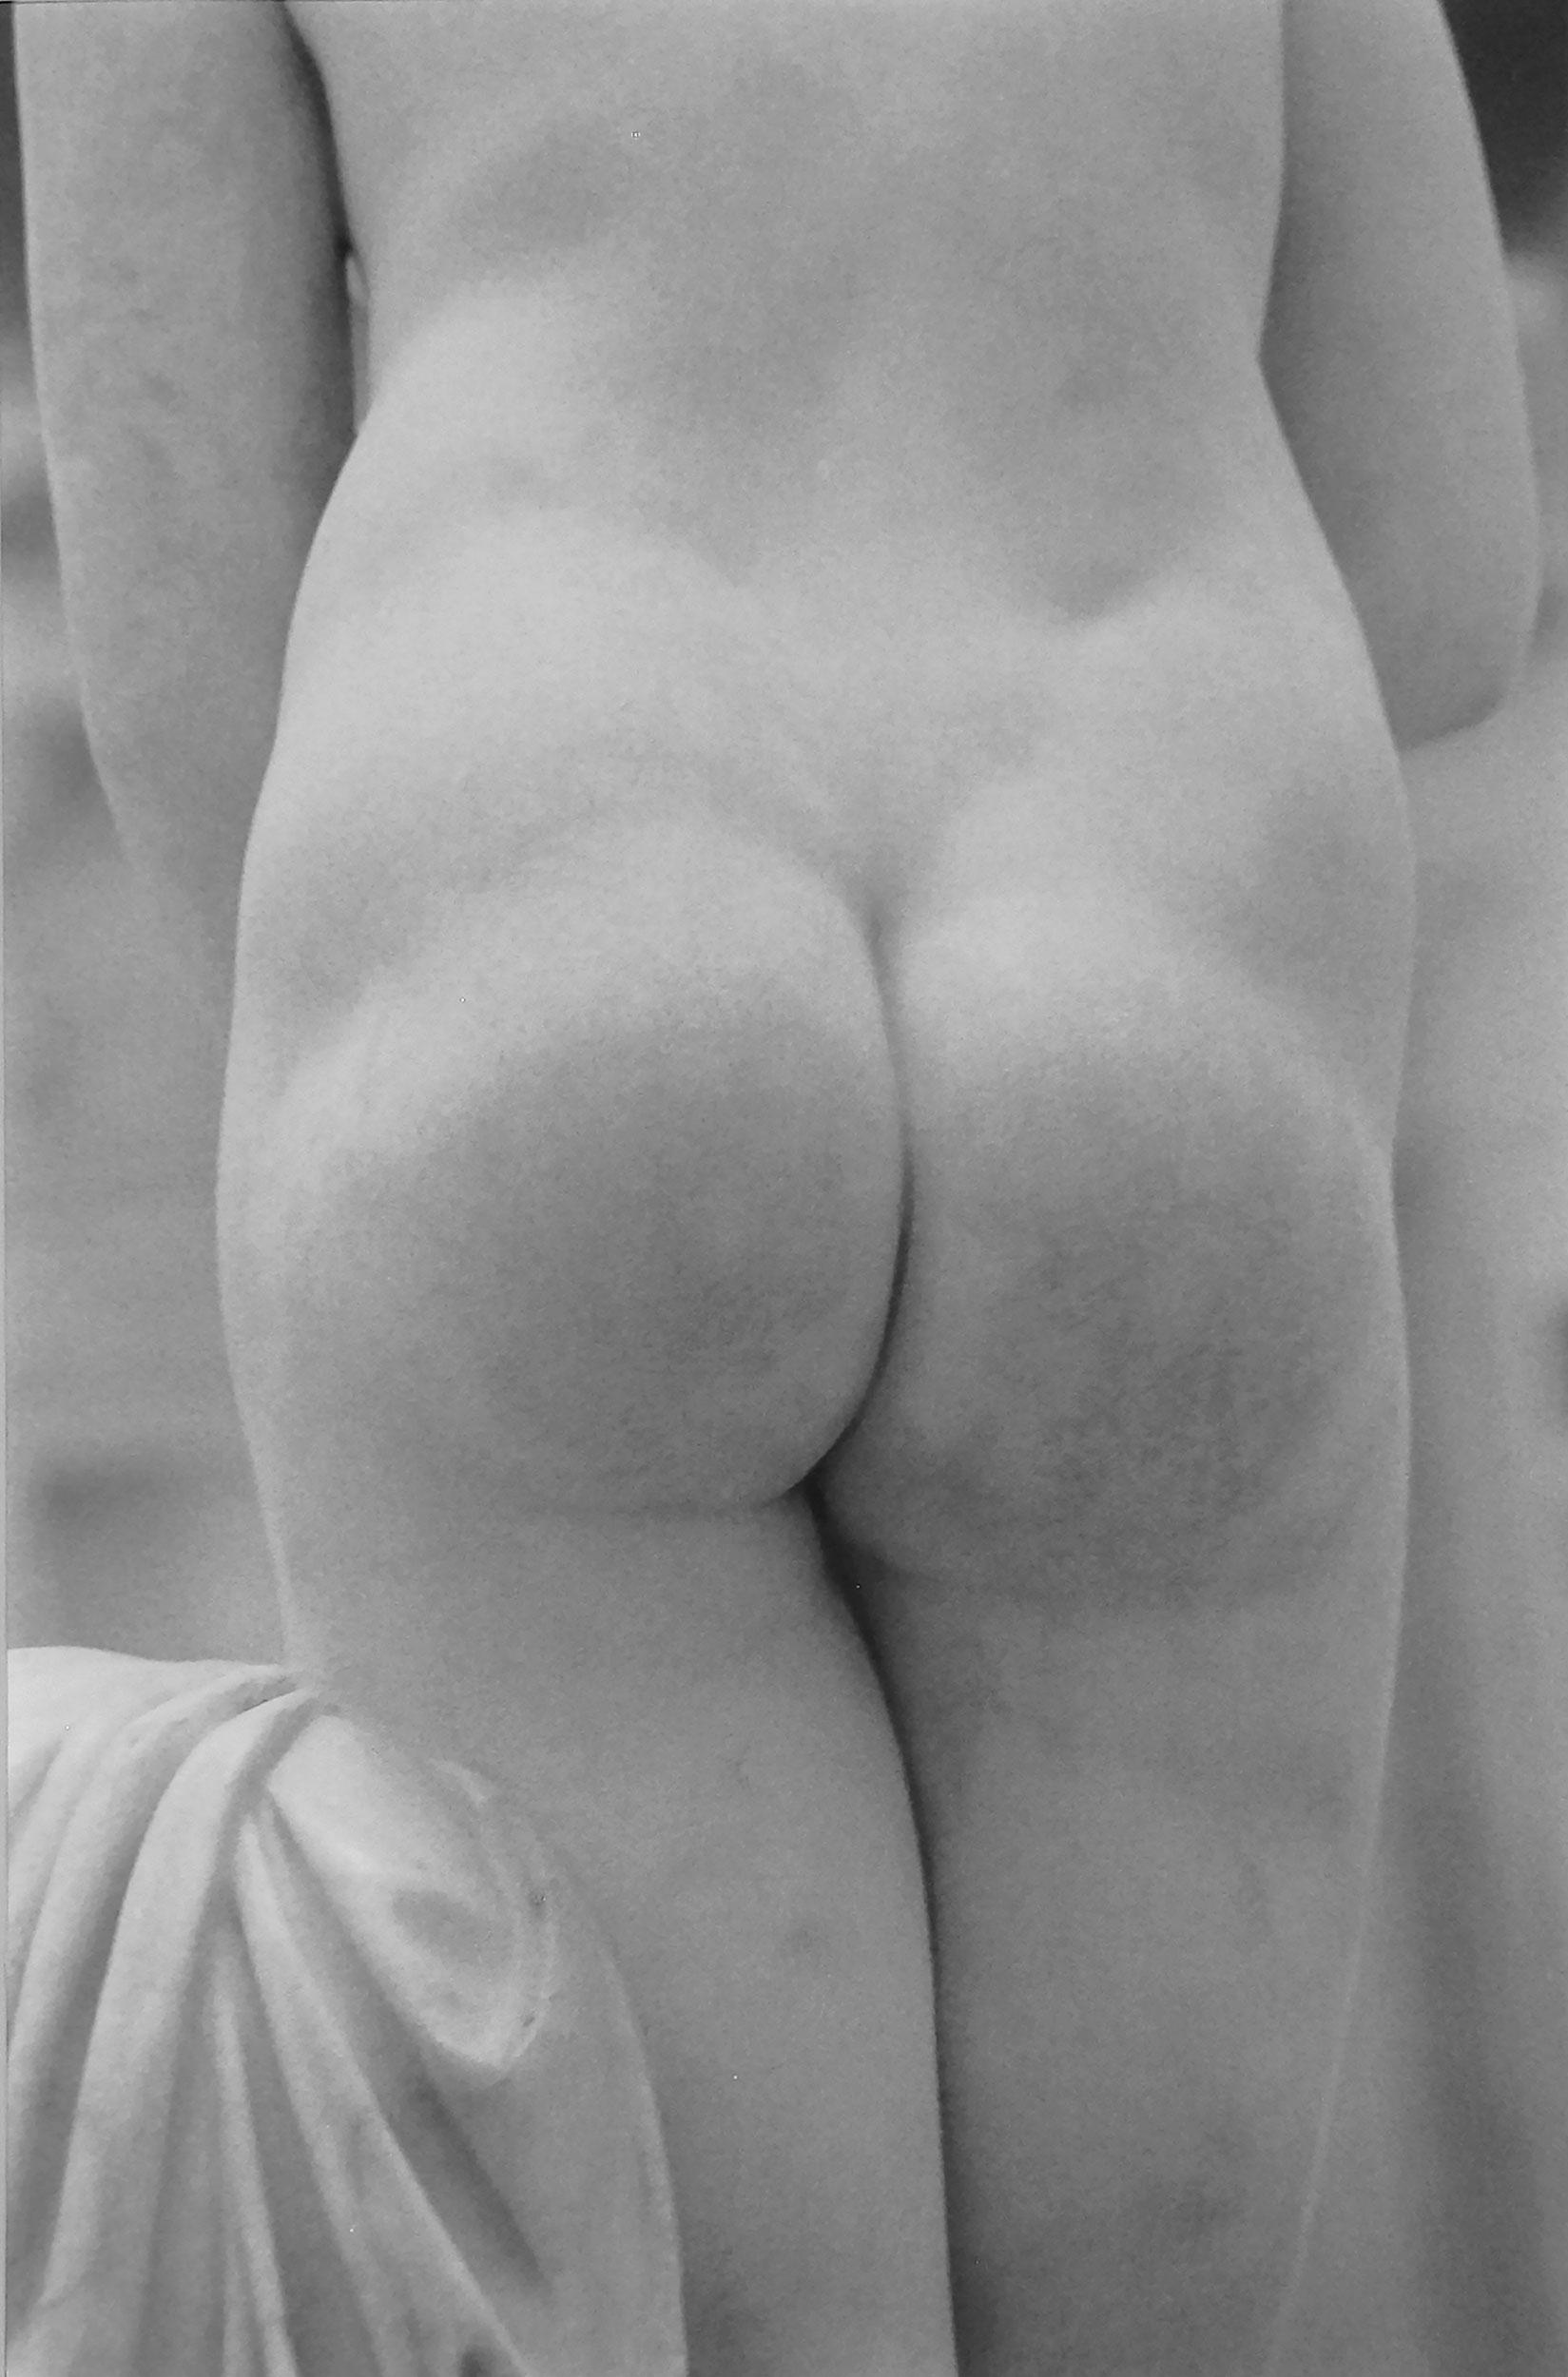 Venus' Bottom